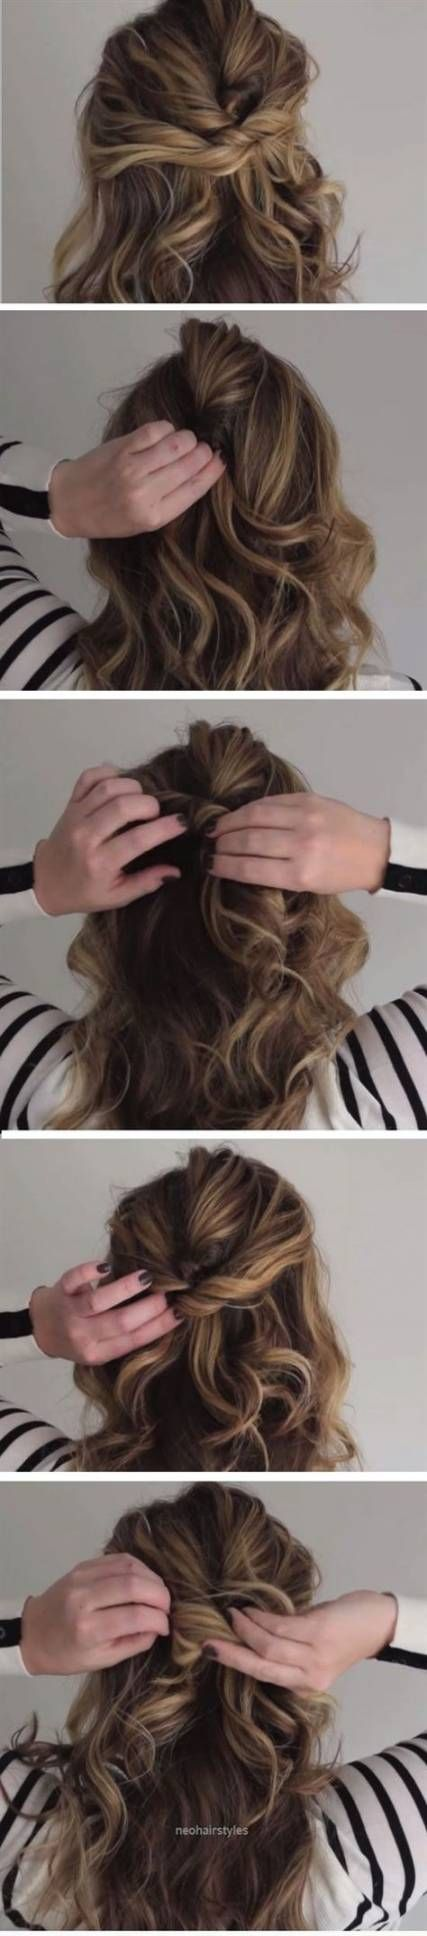 38+ Beste Ideen für Frisuren Easy Diy Half Up